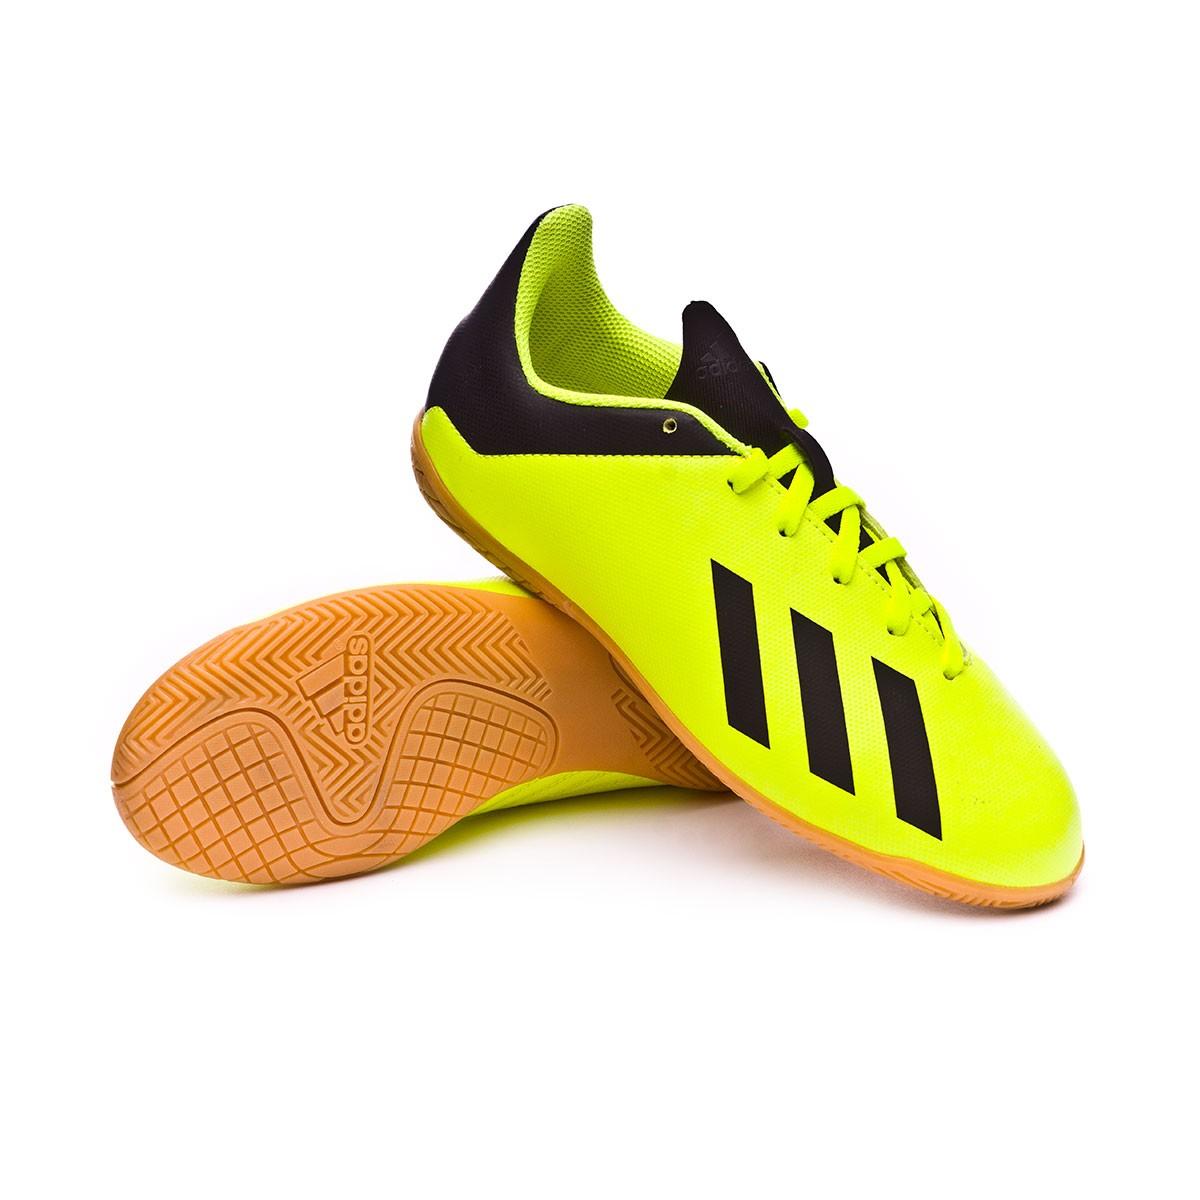 f18ec9e7ee842 Tenis adidas X Tango 18.4 IN Niño Solar yellow-Core black-Solar yellow -  Tienda de fútbol Fútbol Emotion